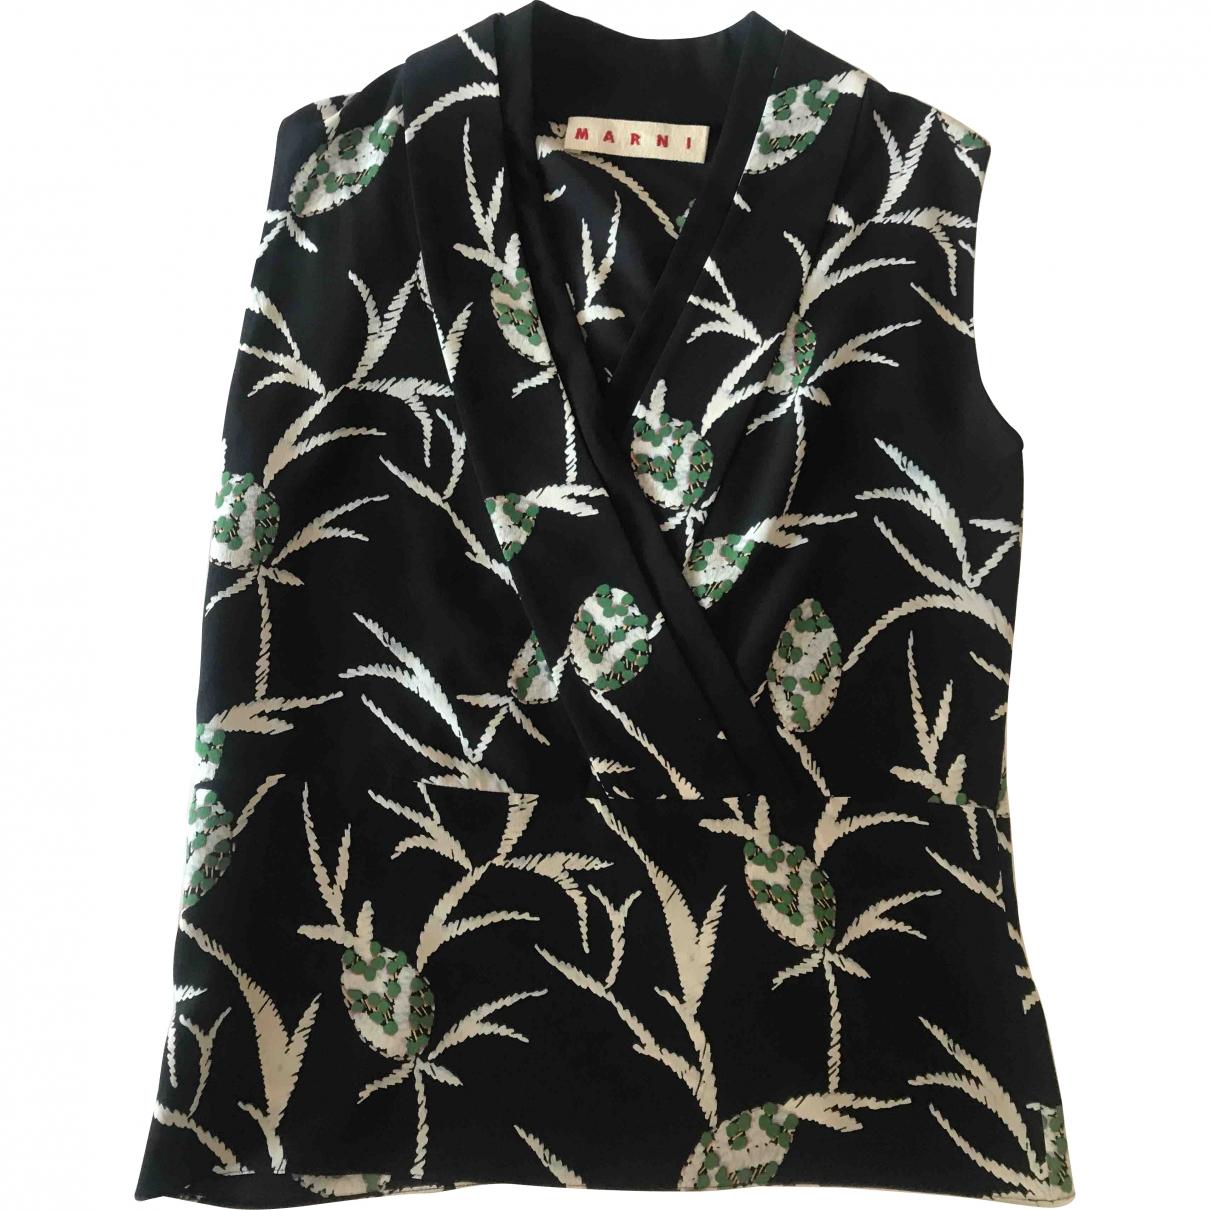 Marni \N Black Silk  top for Women 38 IT